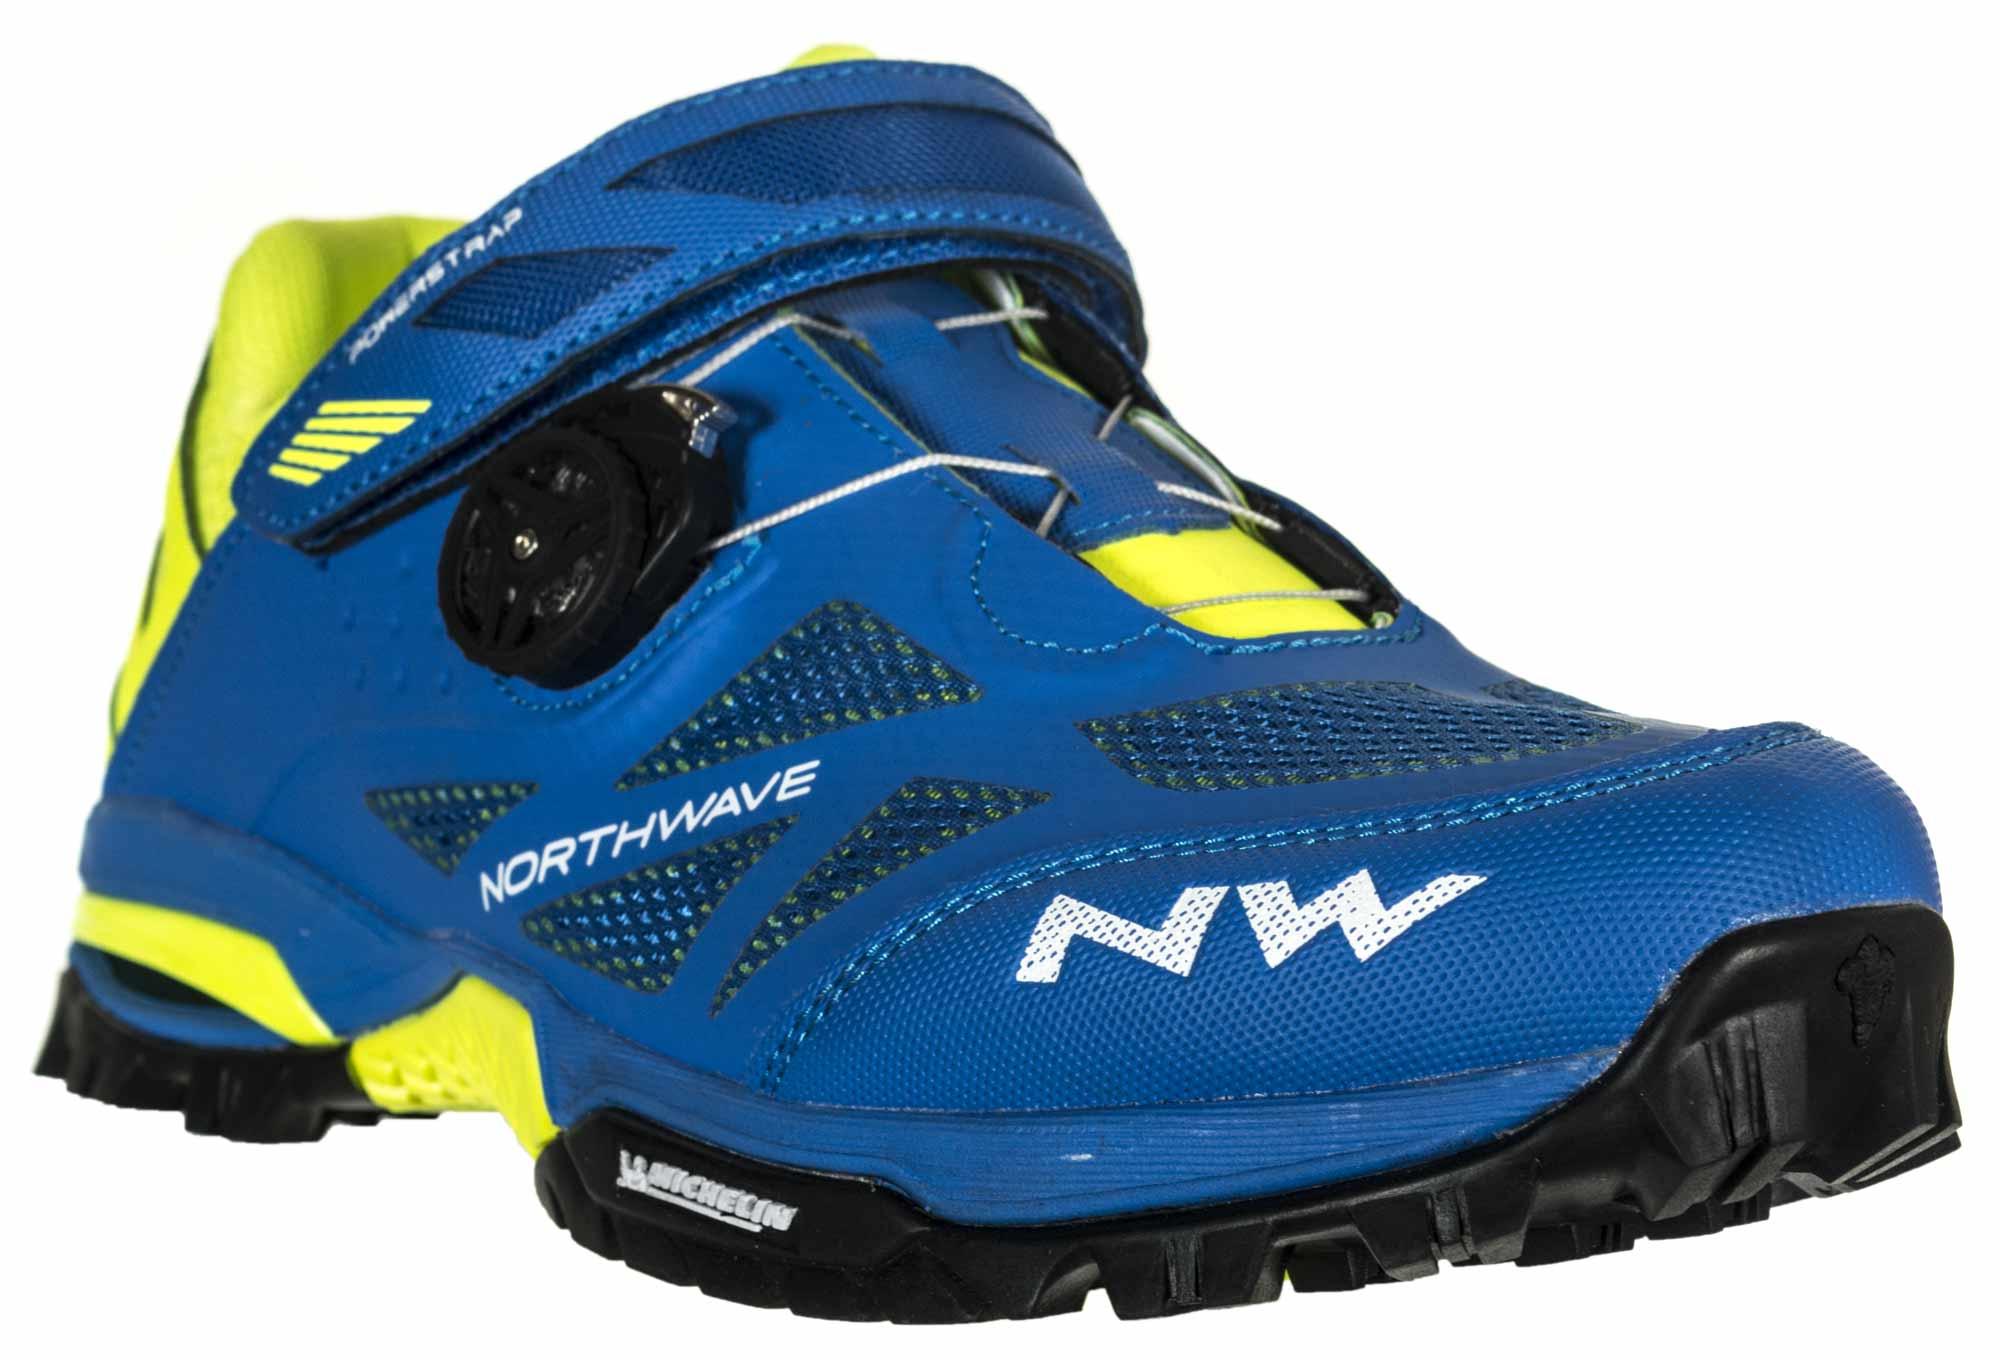 buy popular pretty nice various colors Paire de Chaussures VTT NORTHWAVE ENDURO MID Bleu Jaune